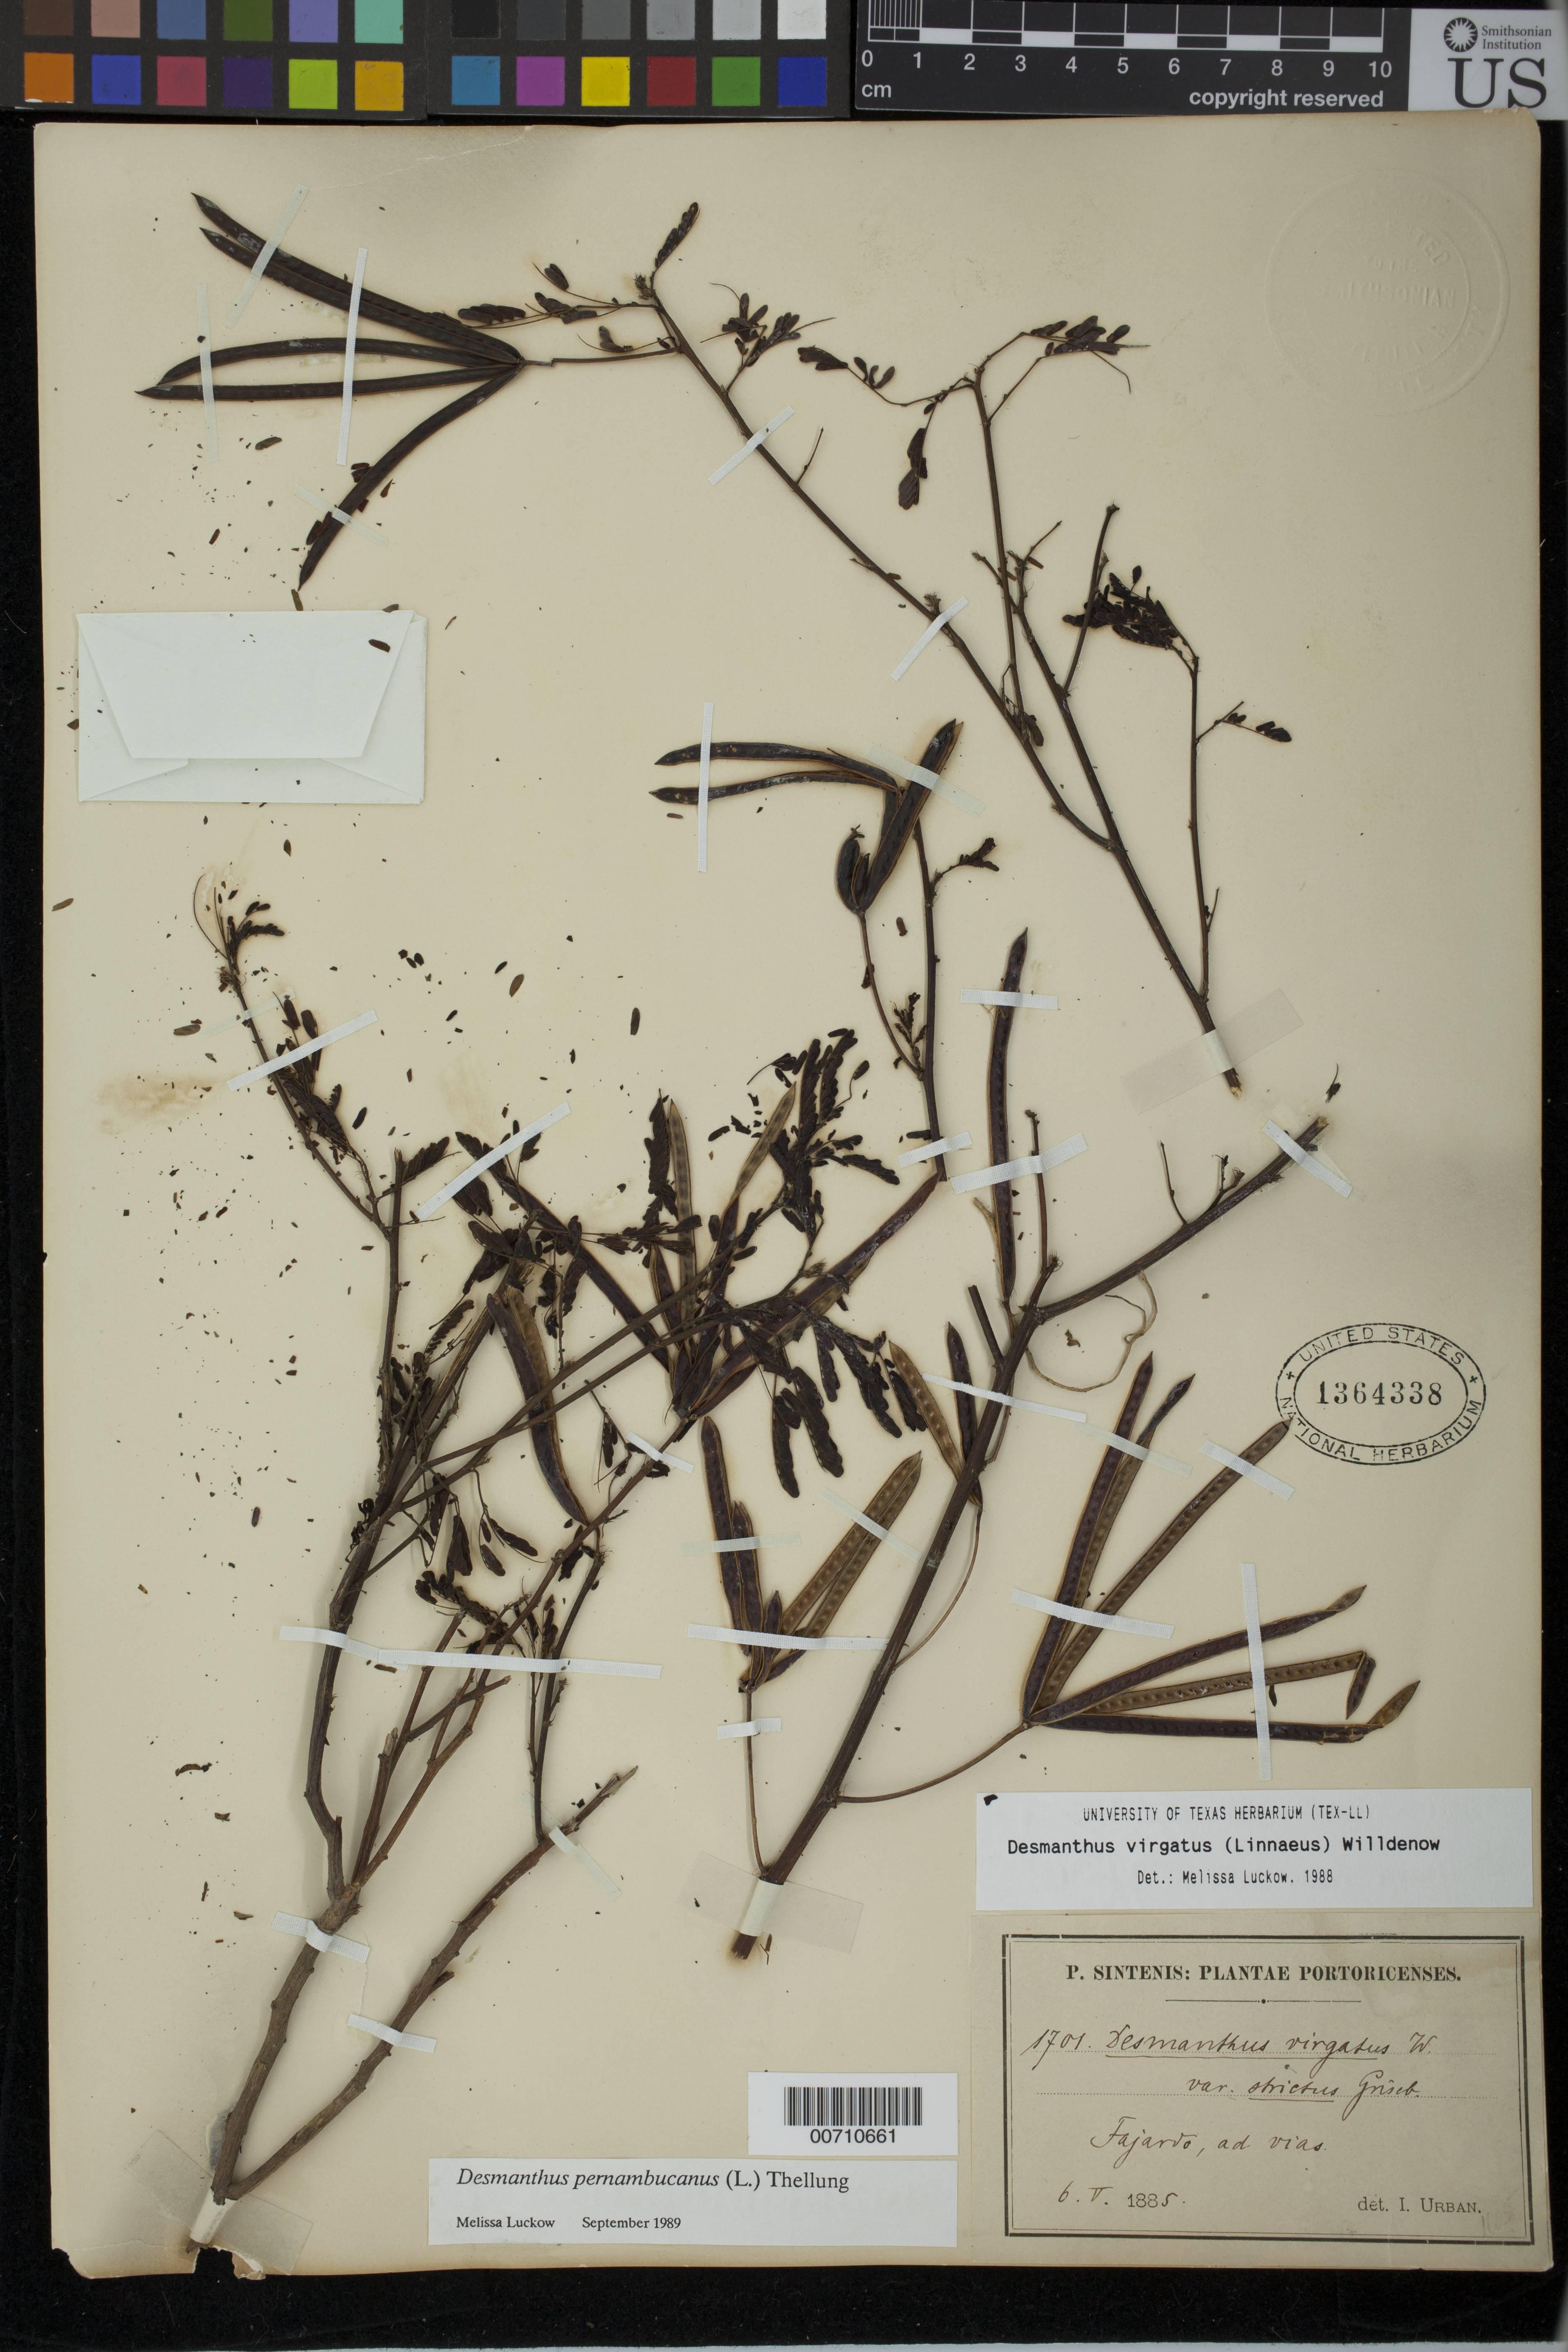 Image of pigeon bundleflower